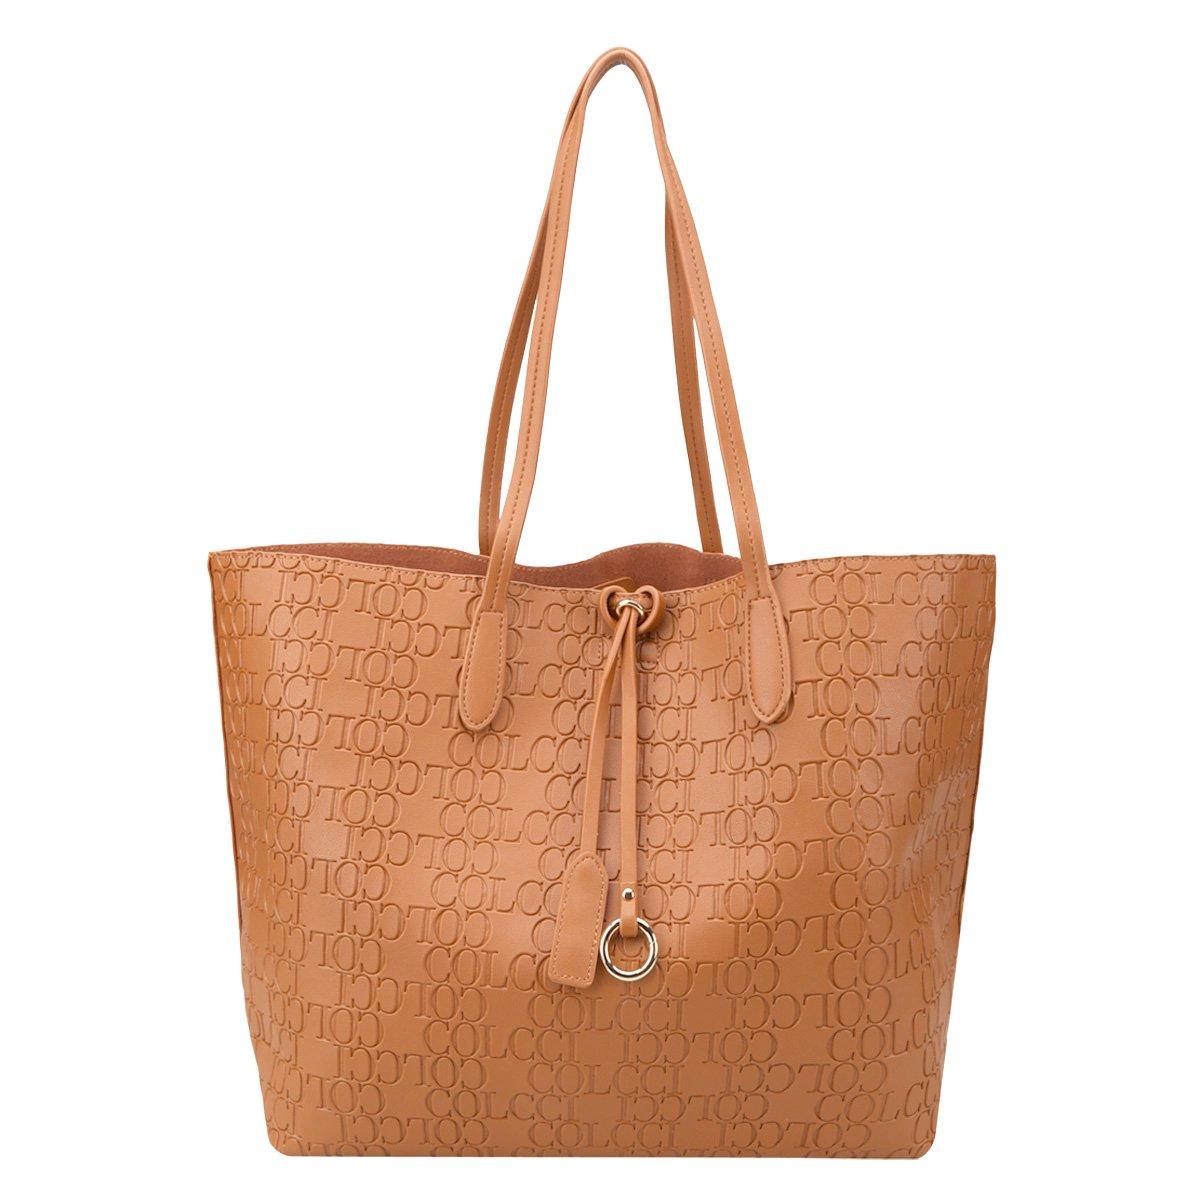 Bolsa Feminina Rusty : Zattini bolsas femininas bolsa shoestock saco tiracolo